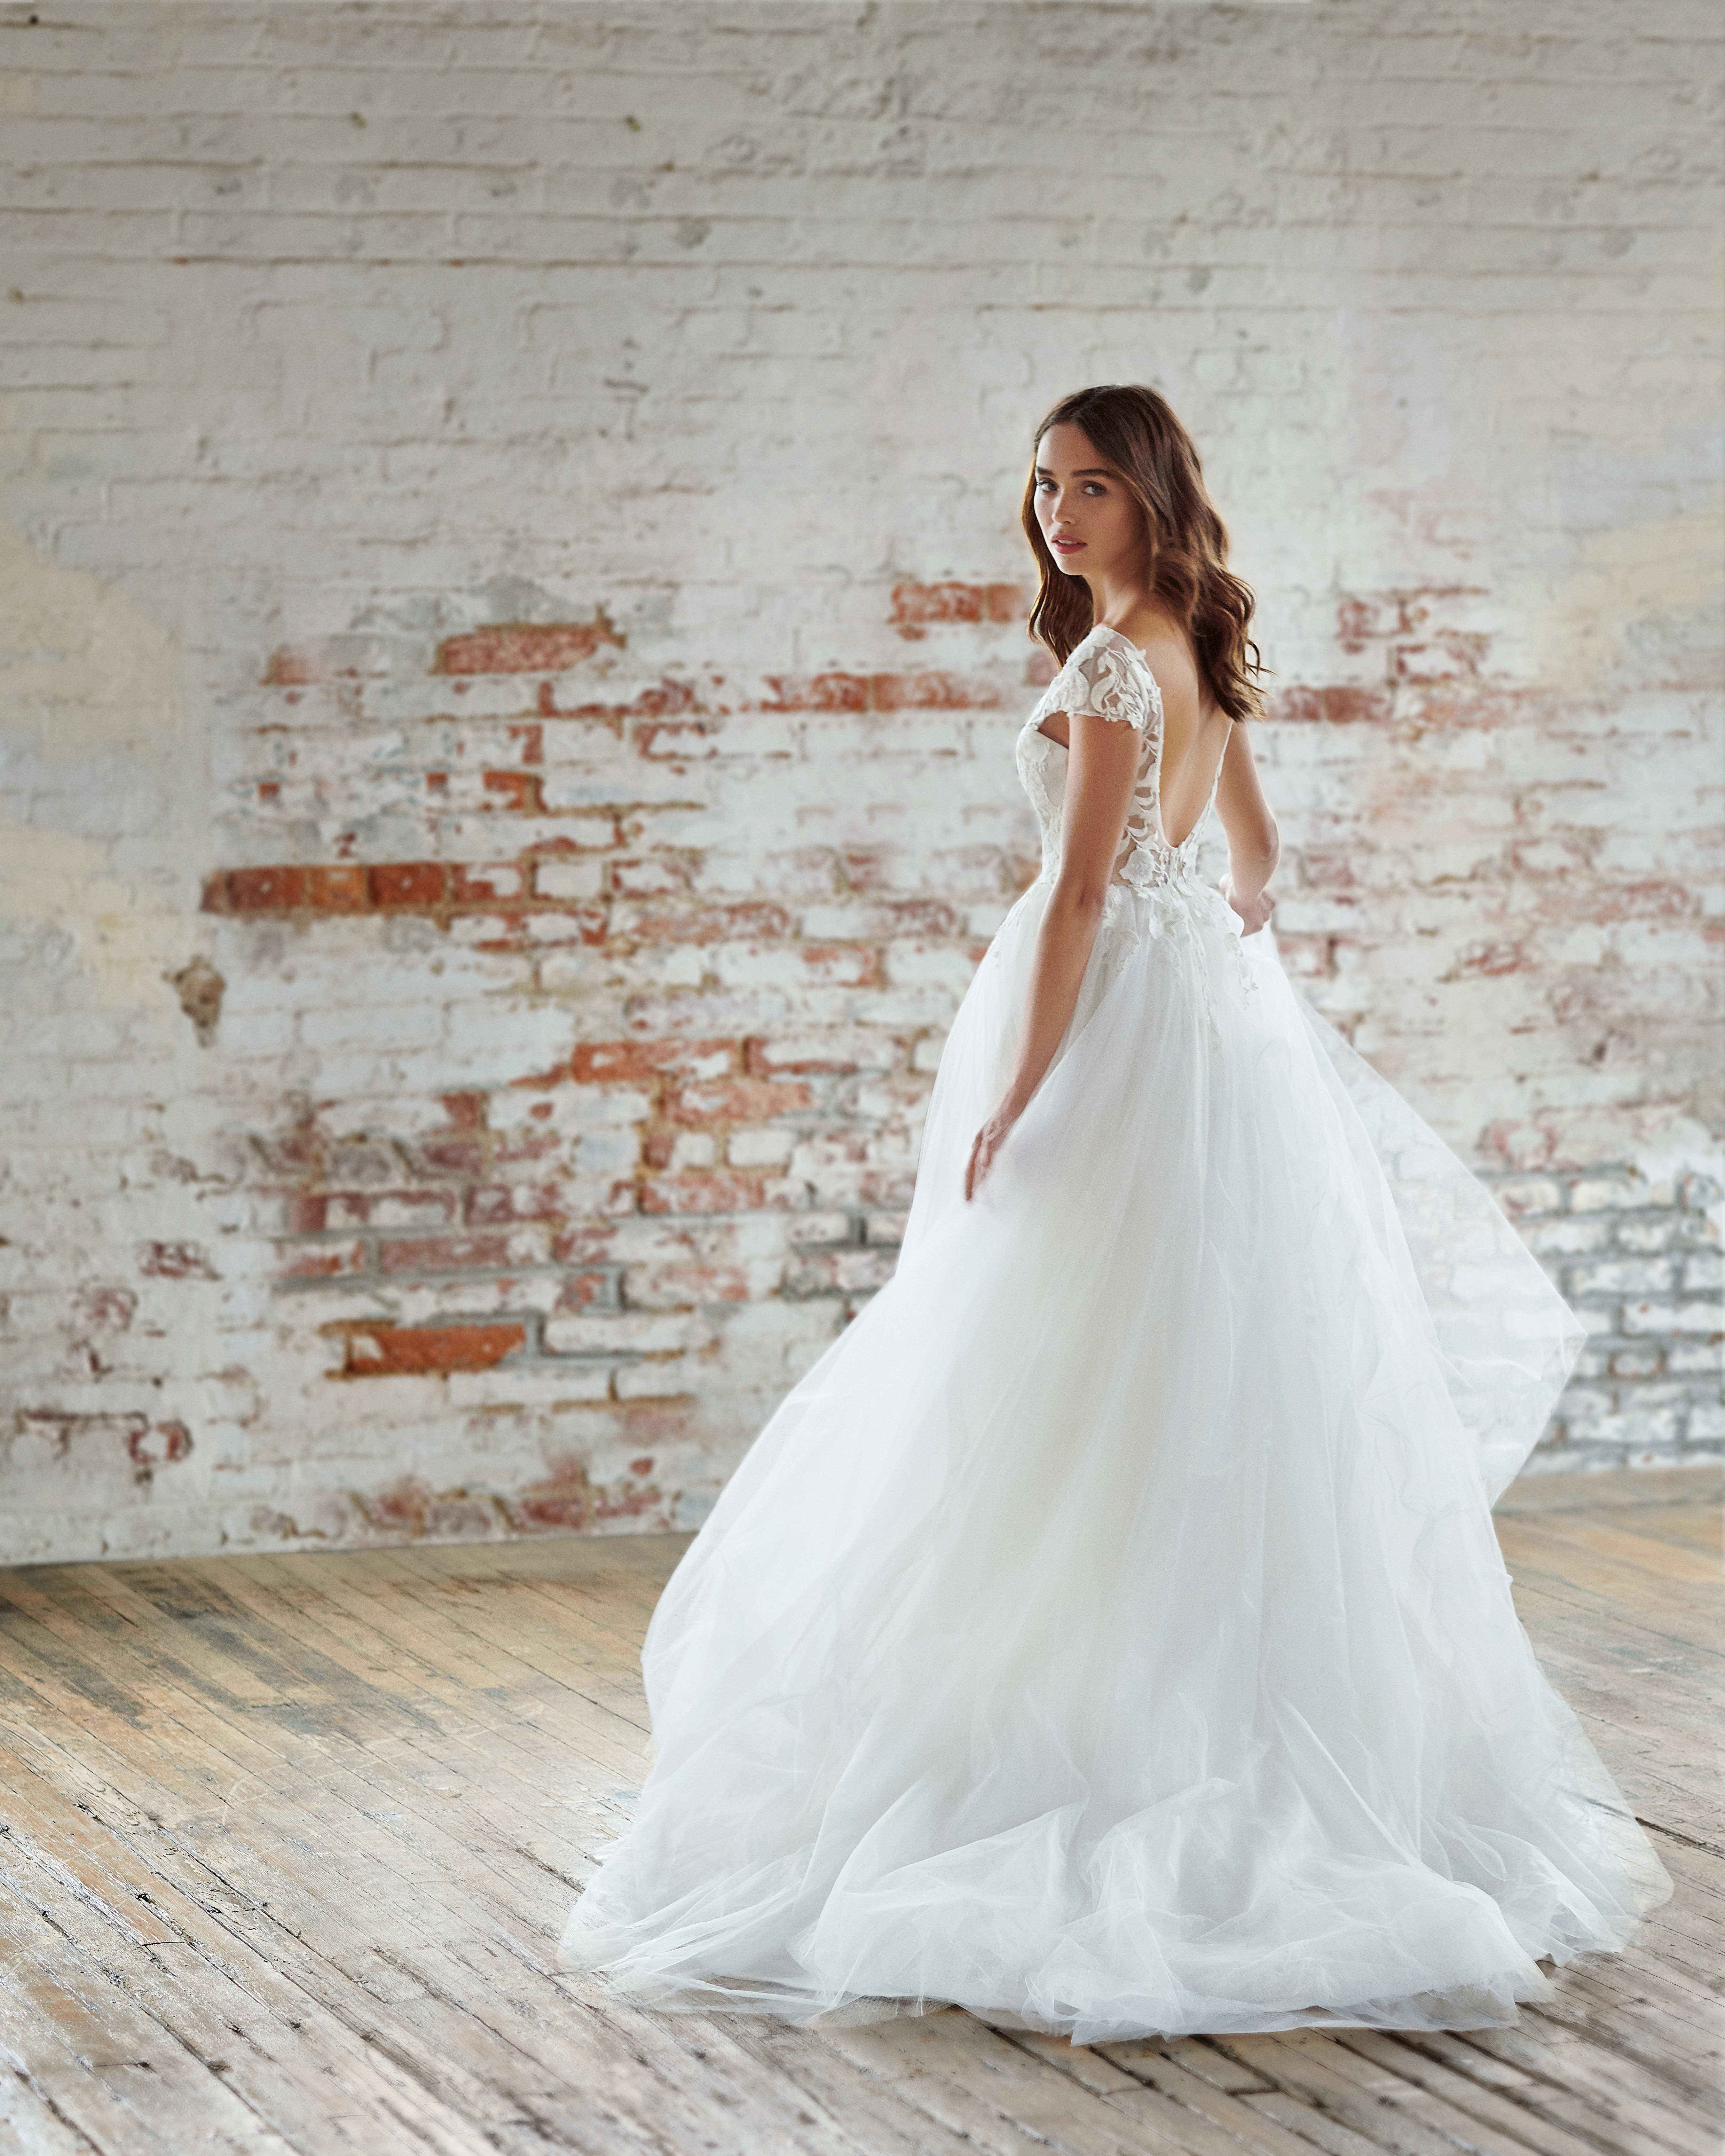 ti adora bridal jolie wedding dresses Wedding Dress wedding dresses bridal shop store gowns christchurch wellington